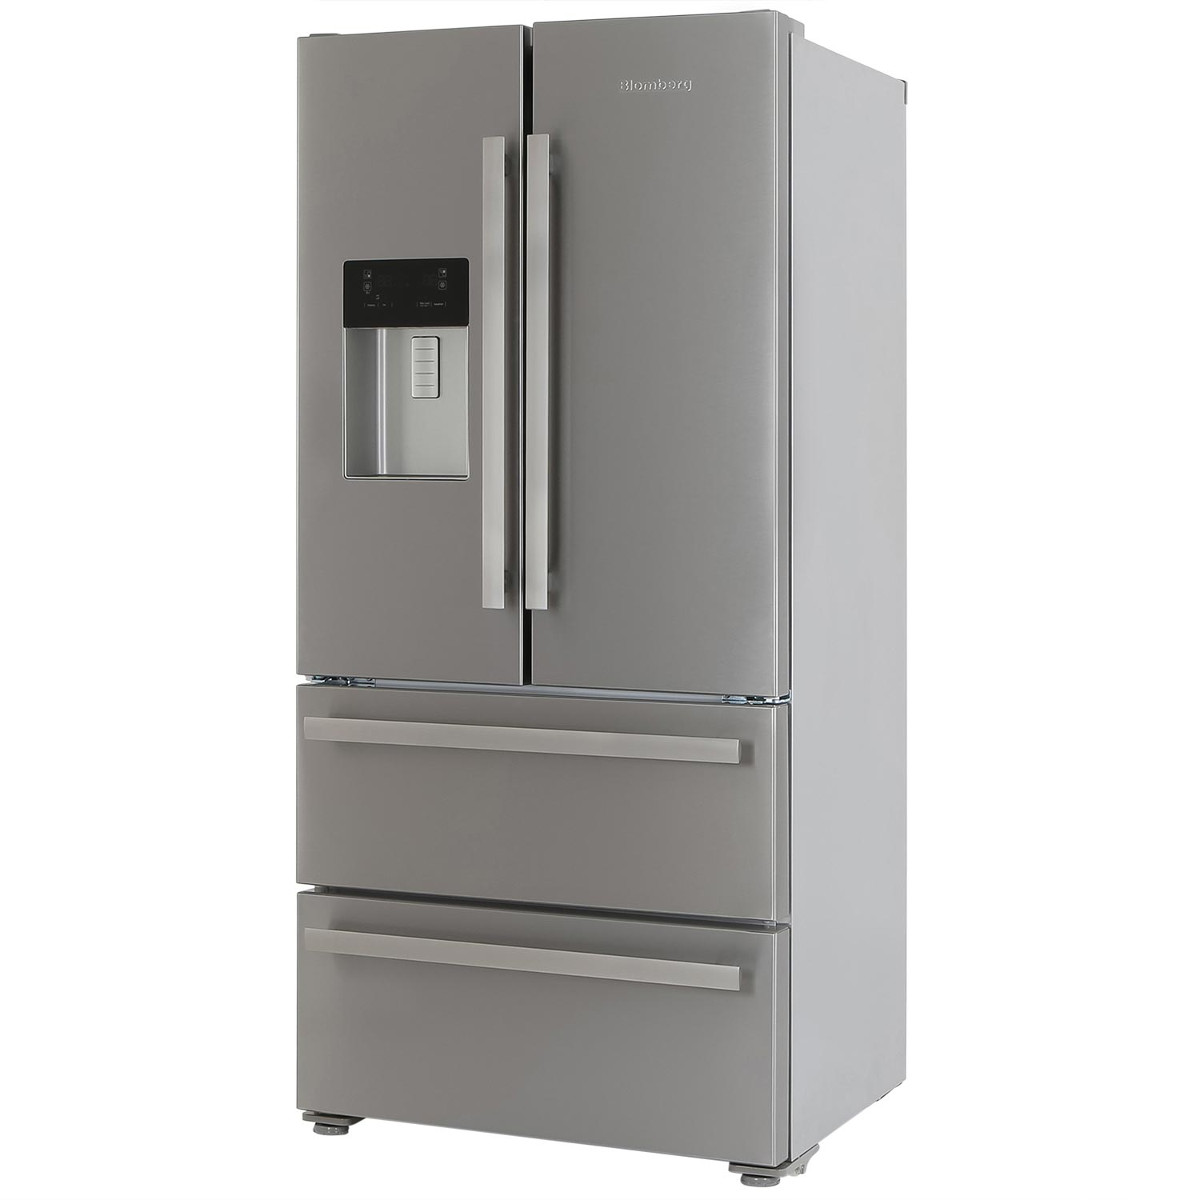 blomberg kfd4952xd american style four door fridge freezer. Black Bedroom Furniture Sets. Home Design Ideas